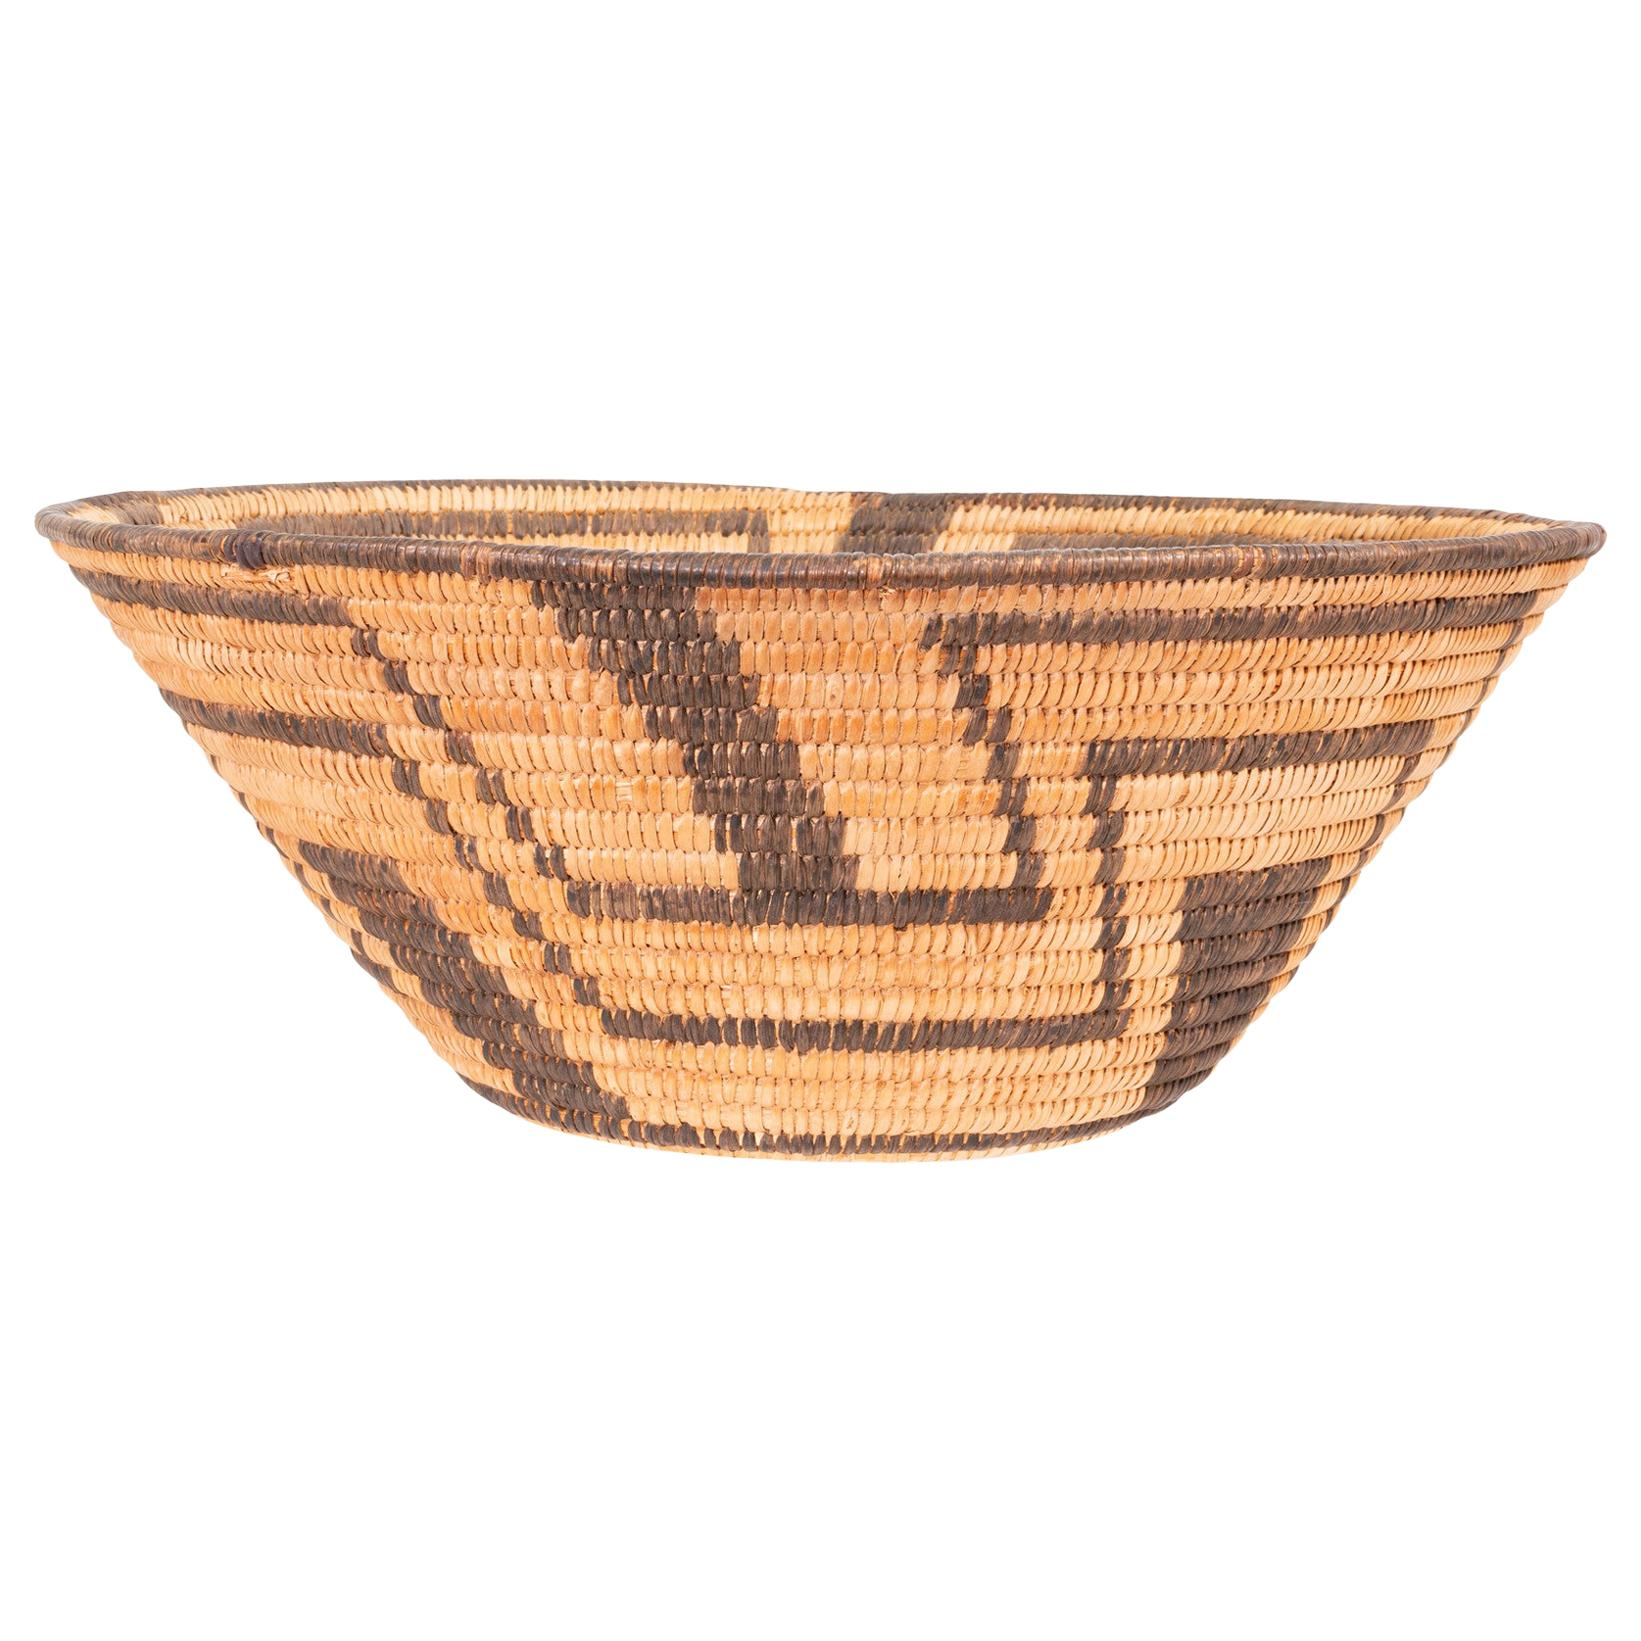 Museum Documented Pima Basket